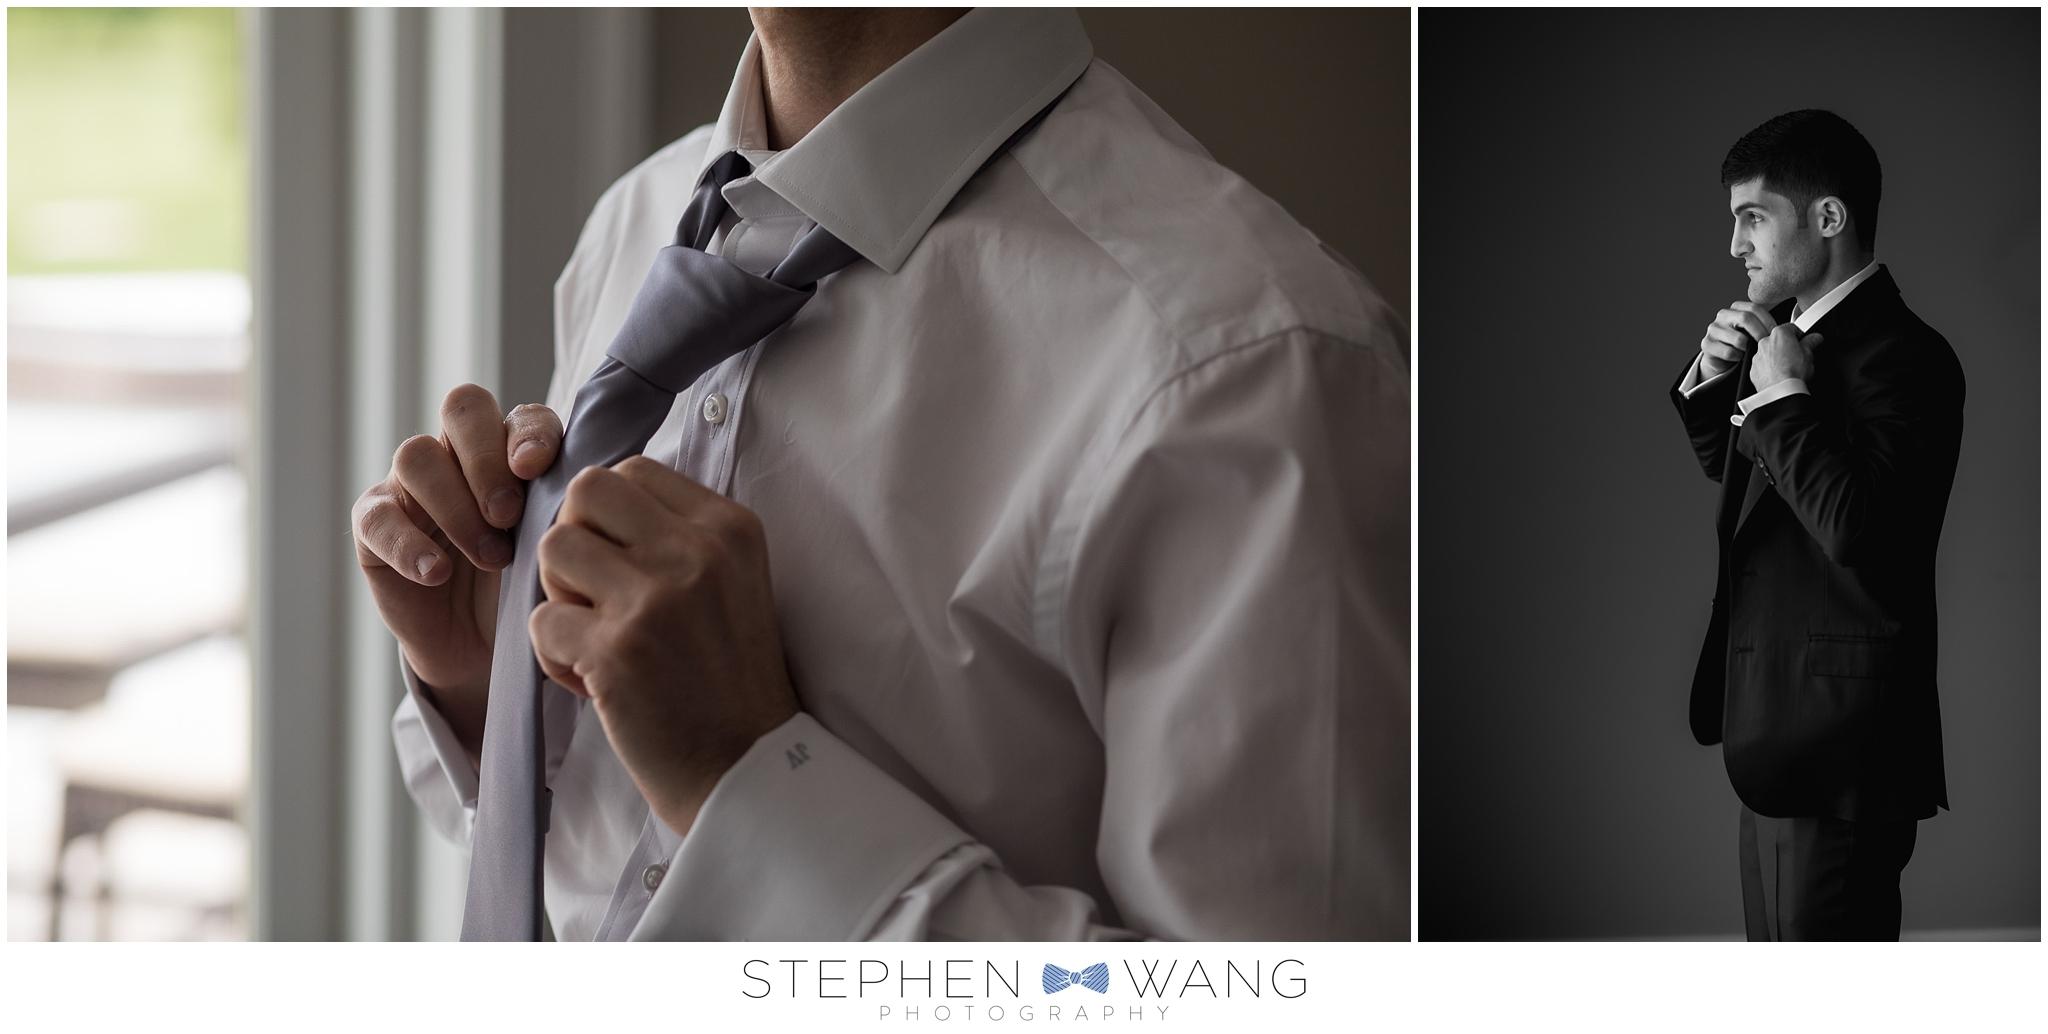 Stephen Wang Photography Shorehaven Norwalk CT Wedding Photographer connecticut shoreline shore haven - 8.jpg